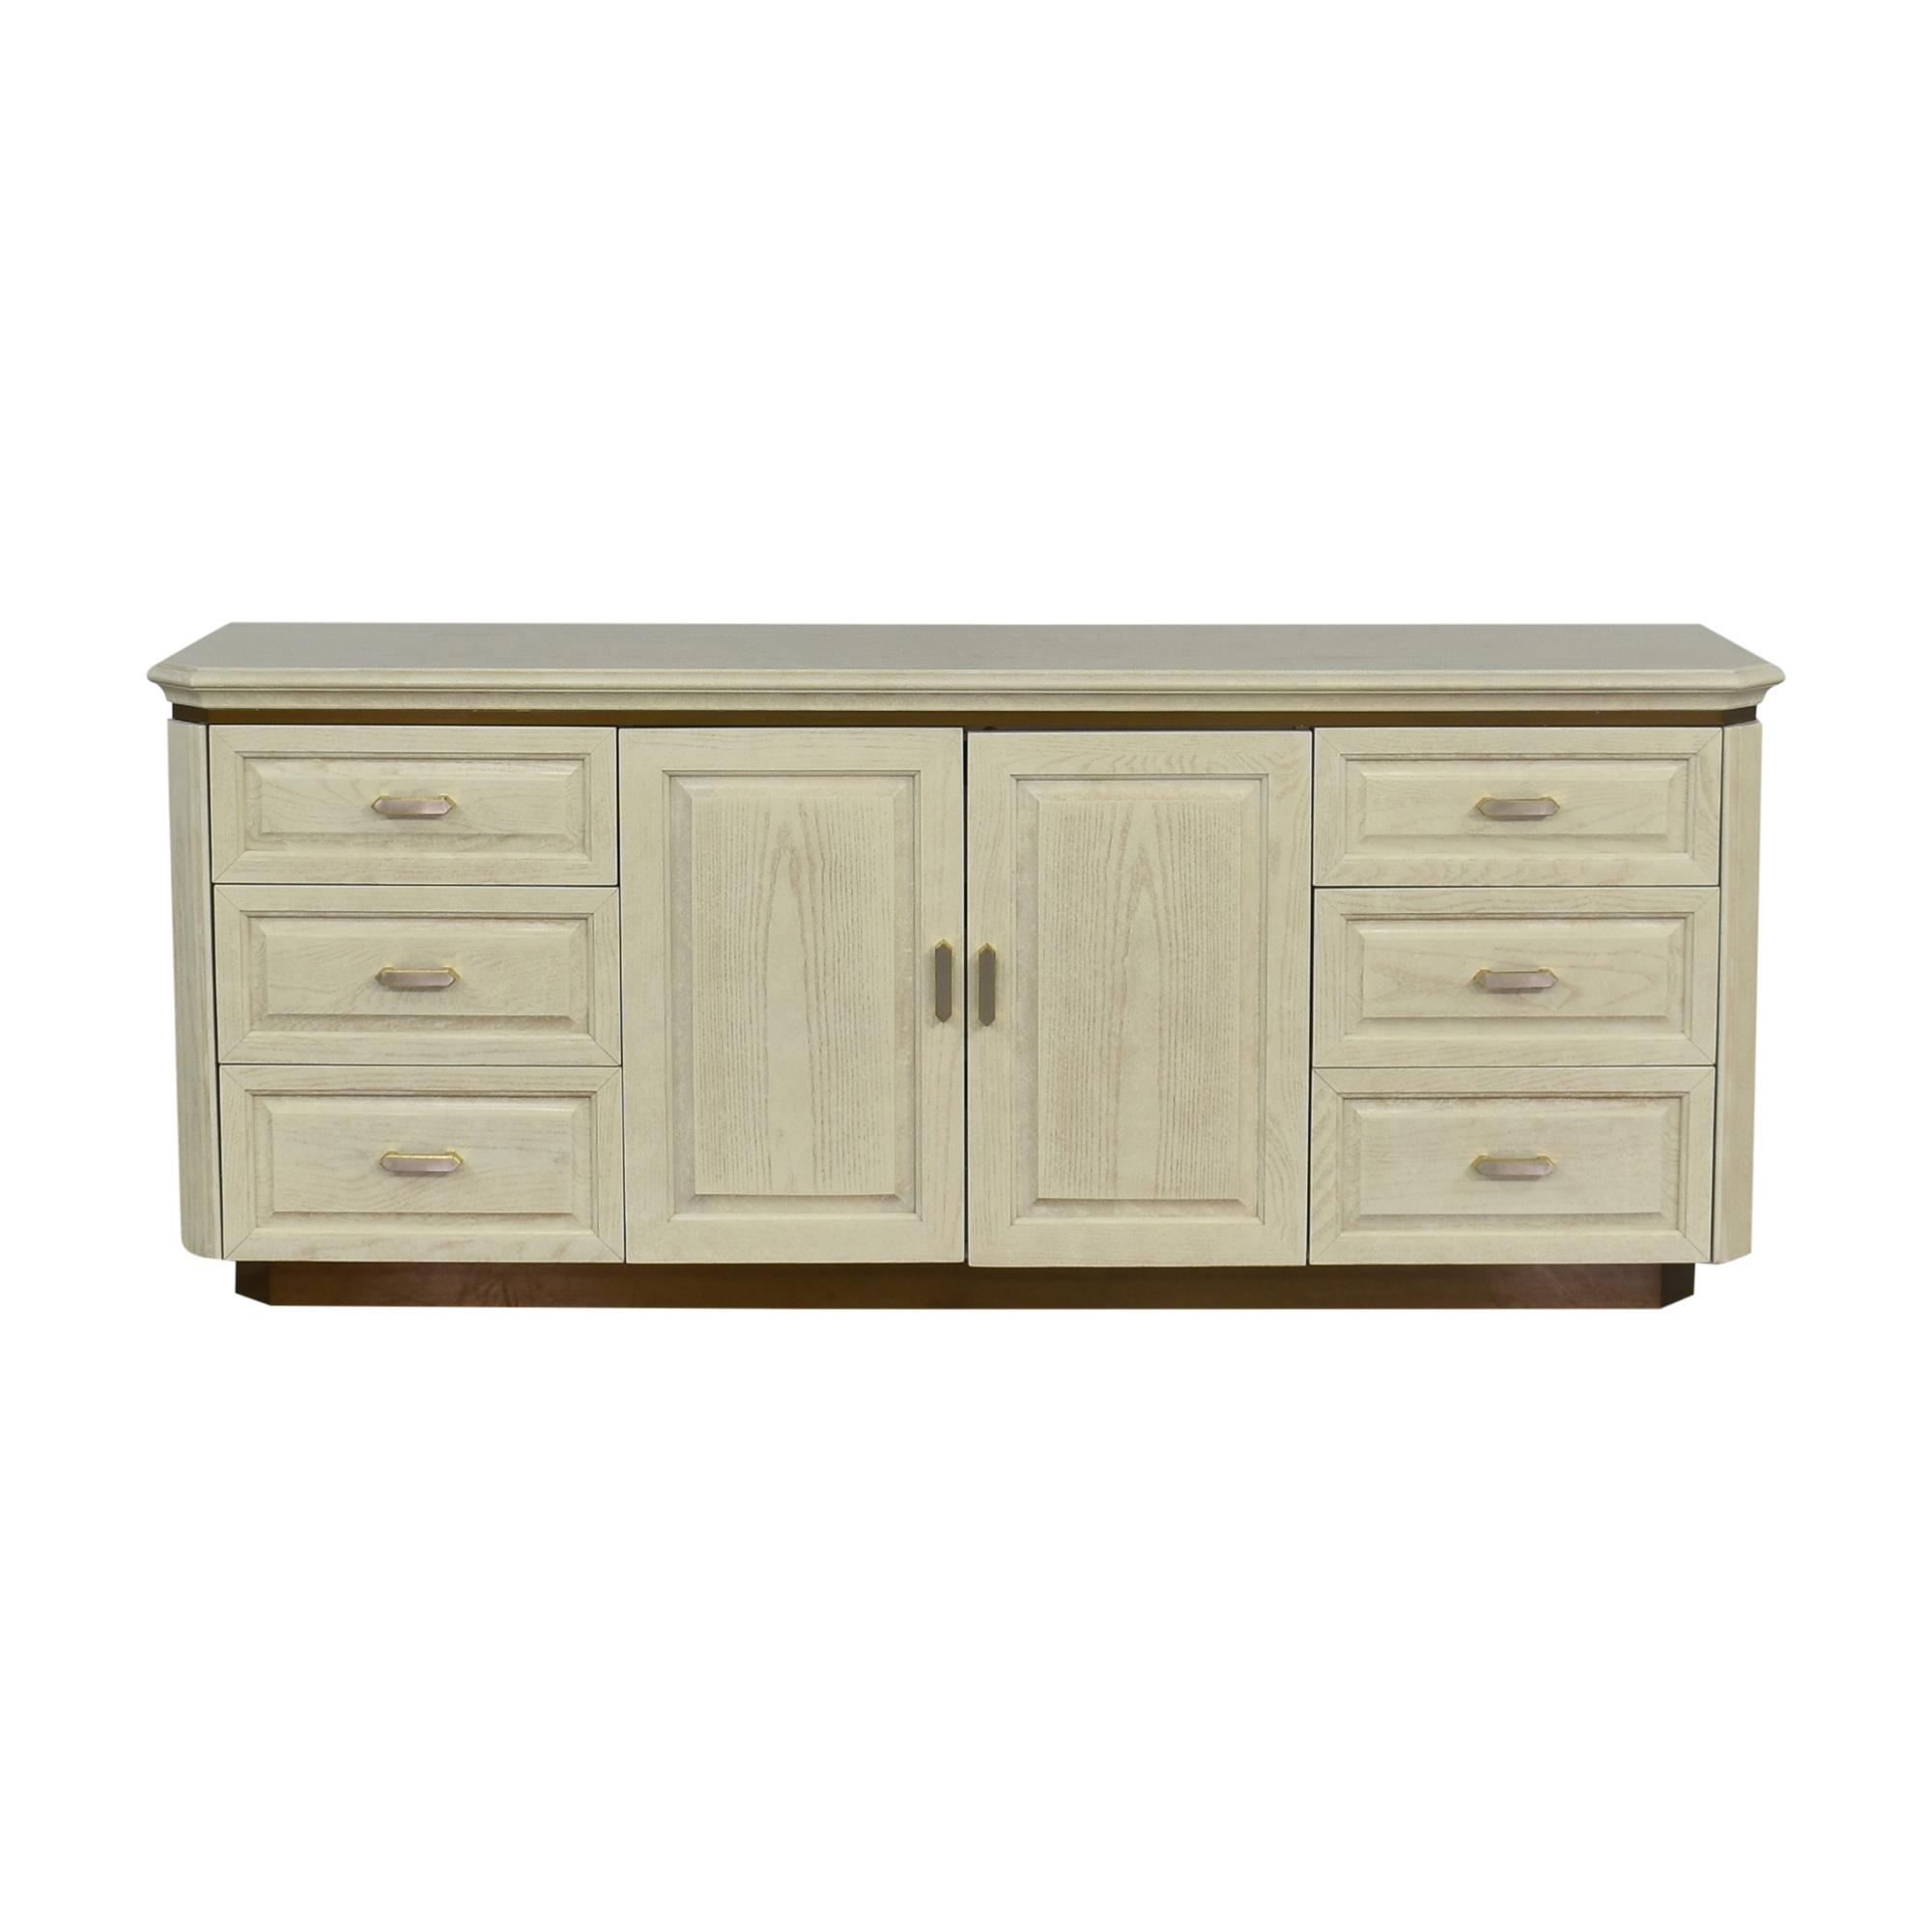 Henredon Furniture Henredon Charisma Triple Dresser white